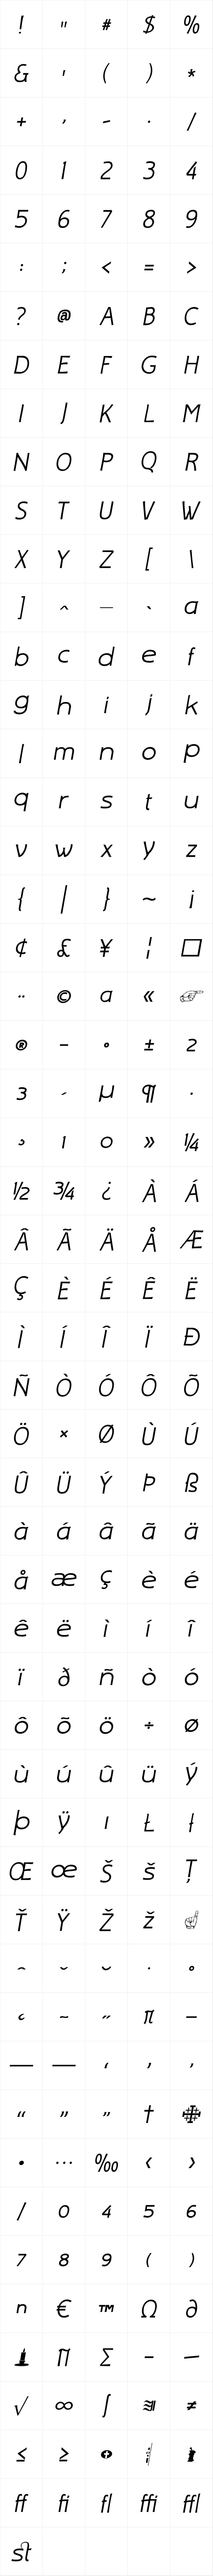 LibrumSans Italic